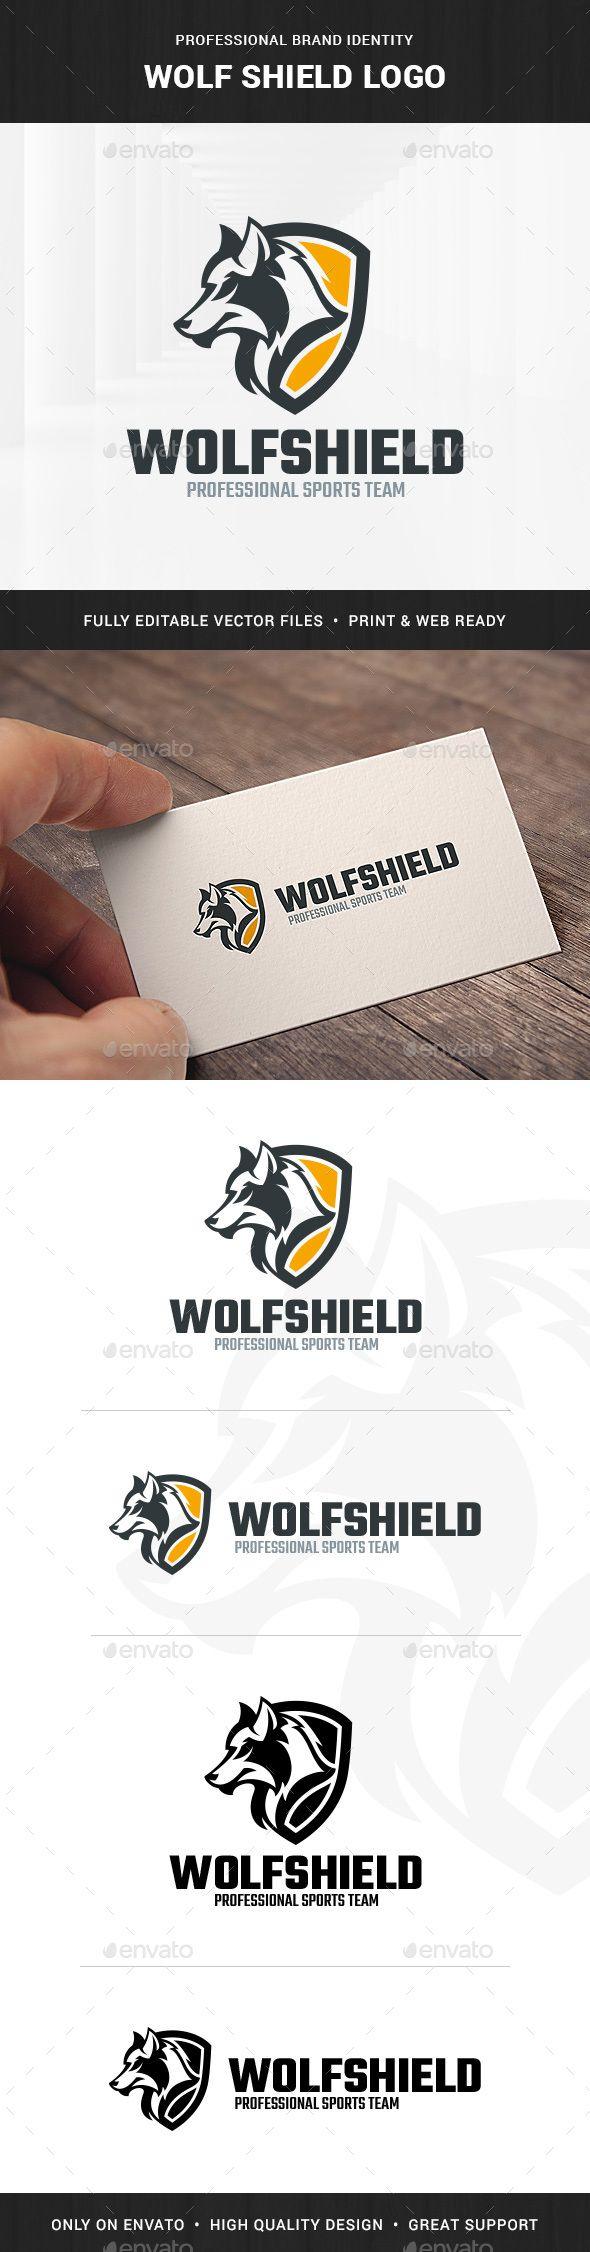 Wolf Shield Logo Template | Shield logo, Logo templates and Wolf